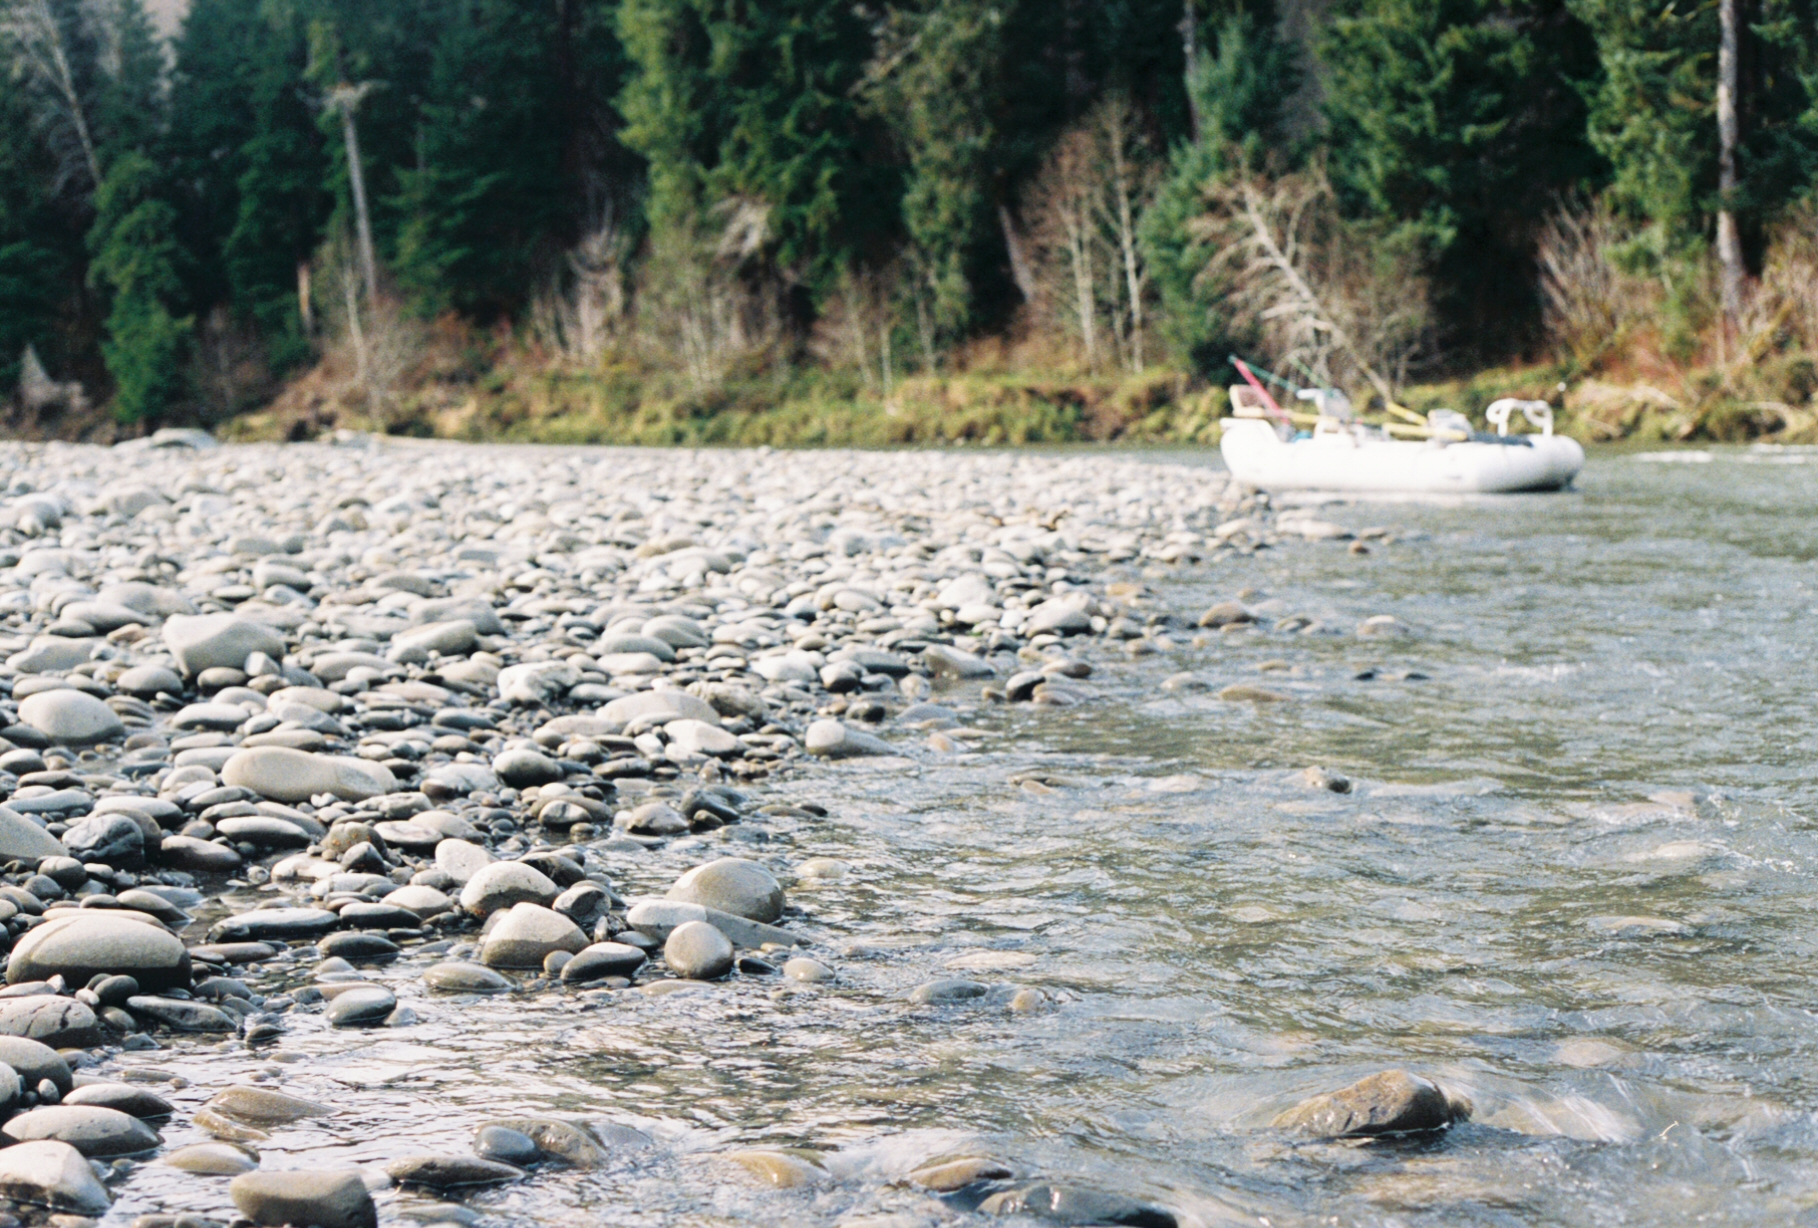 Bogachiel River, Washington